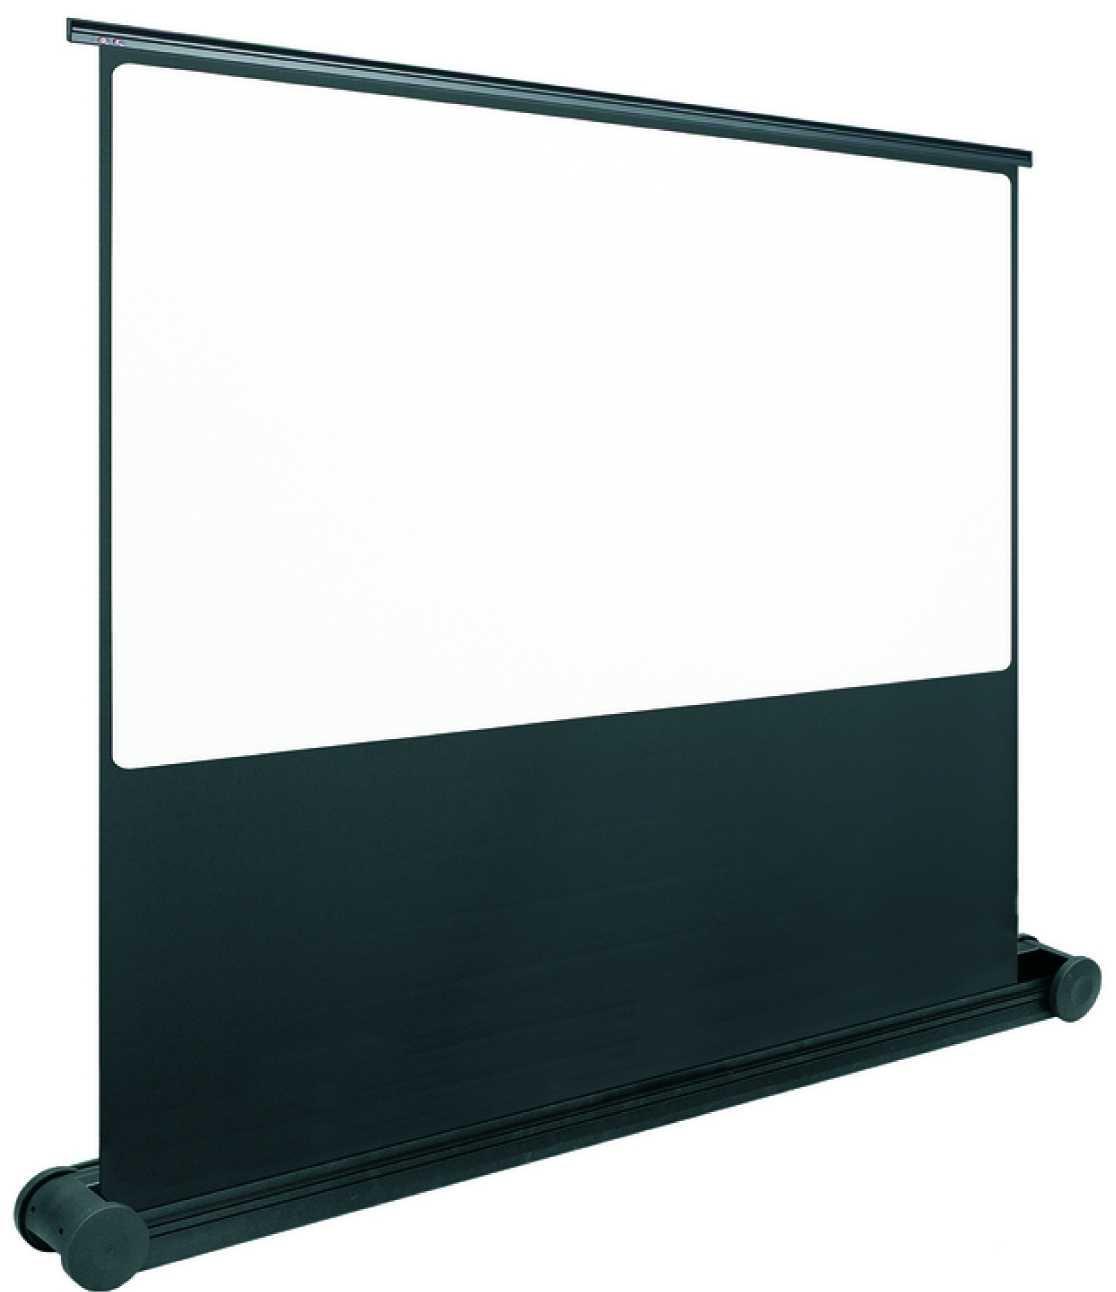 ecran de projection portable oray butterfly mobile 135x180. Black Bedroom Furniture Sets. Home Design Ideas